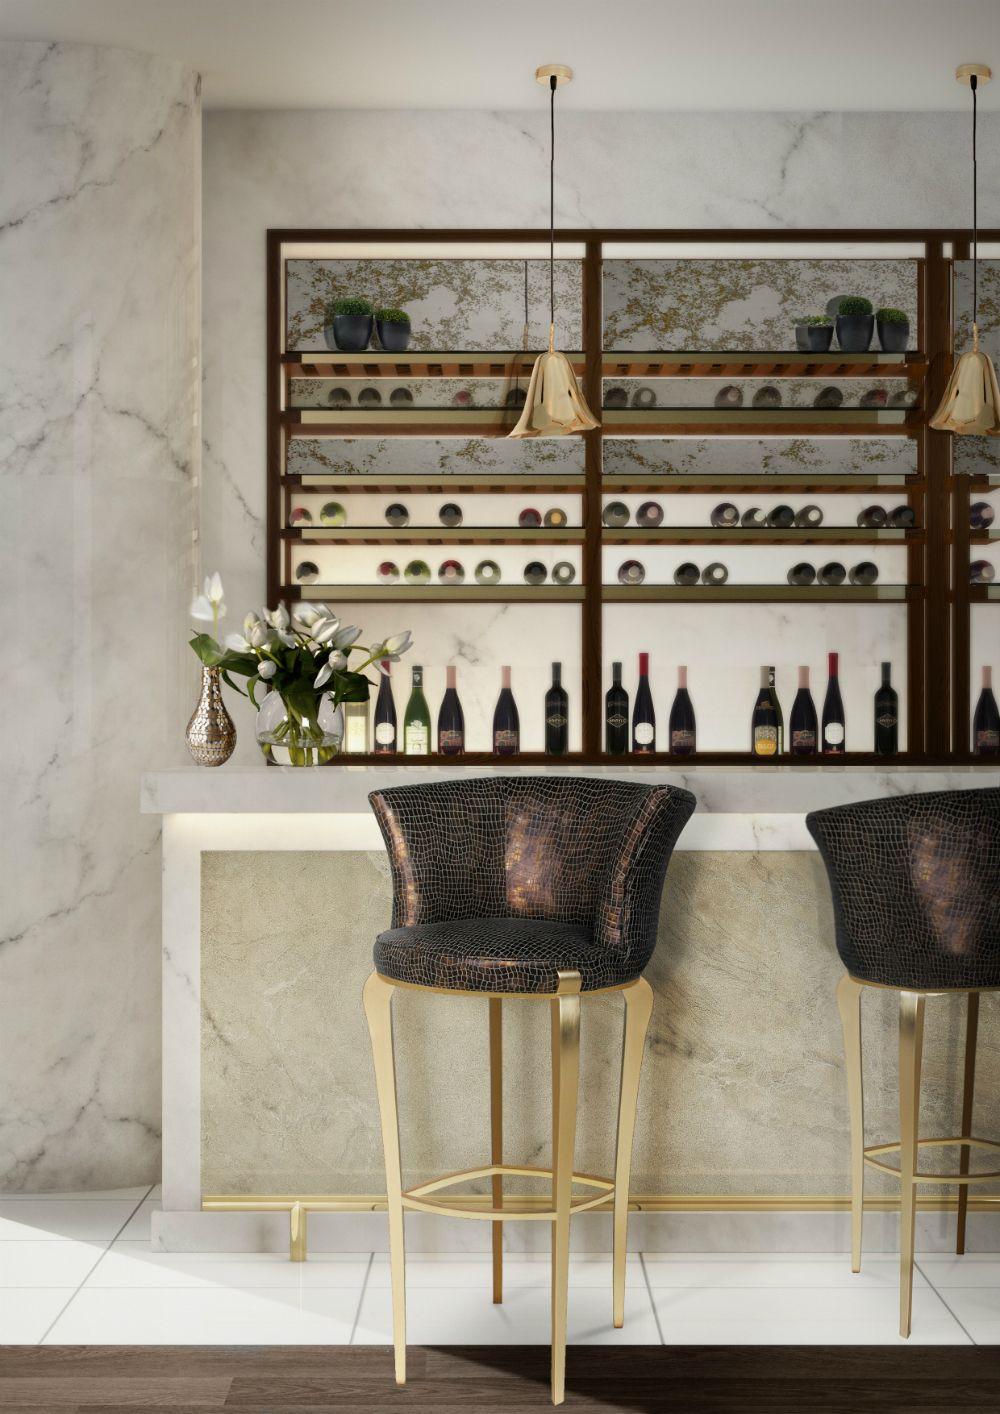 6 Interior Design Trends That Will Shape The TrendsNew York